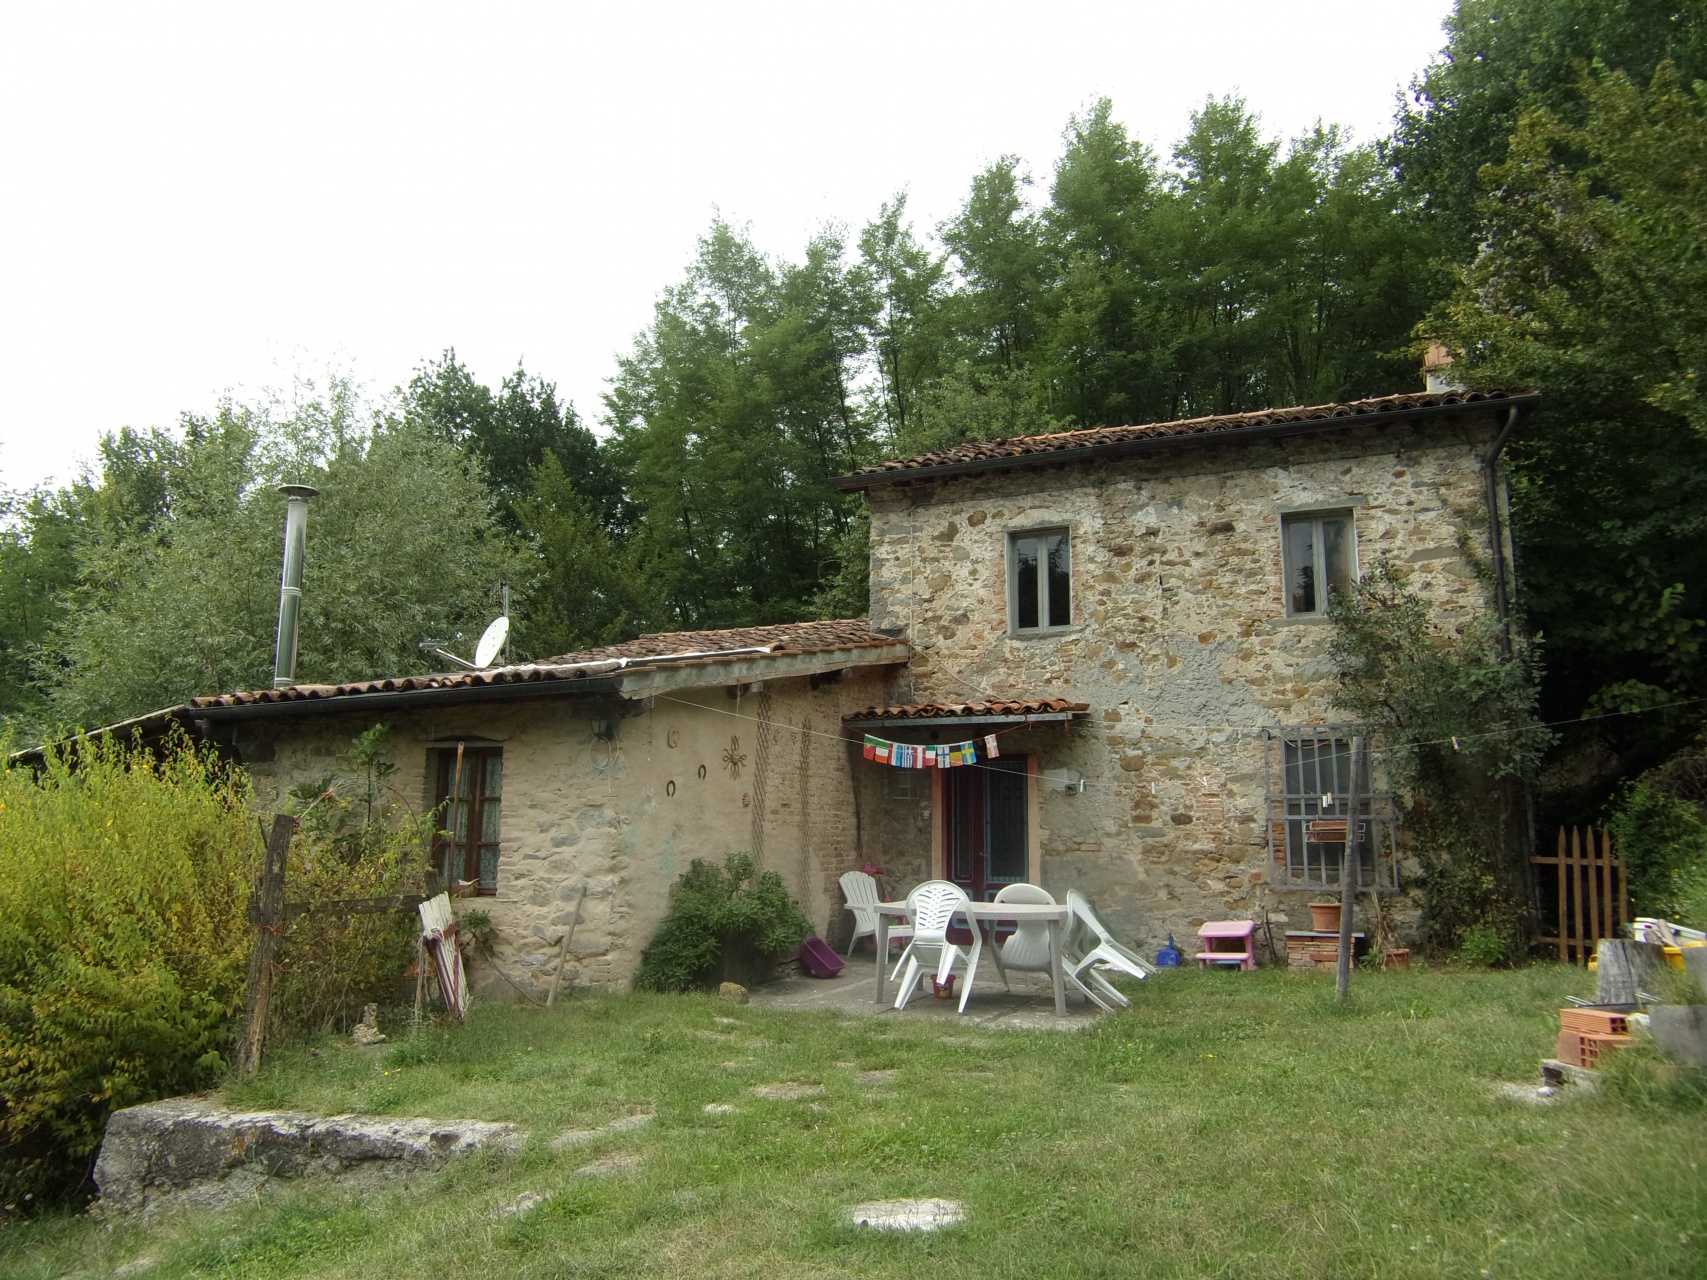 foto Rustico disparte, vicino a Barga, Lucca.